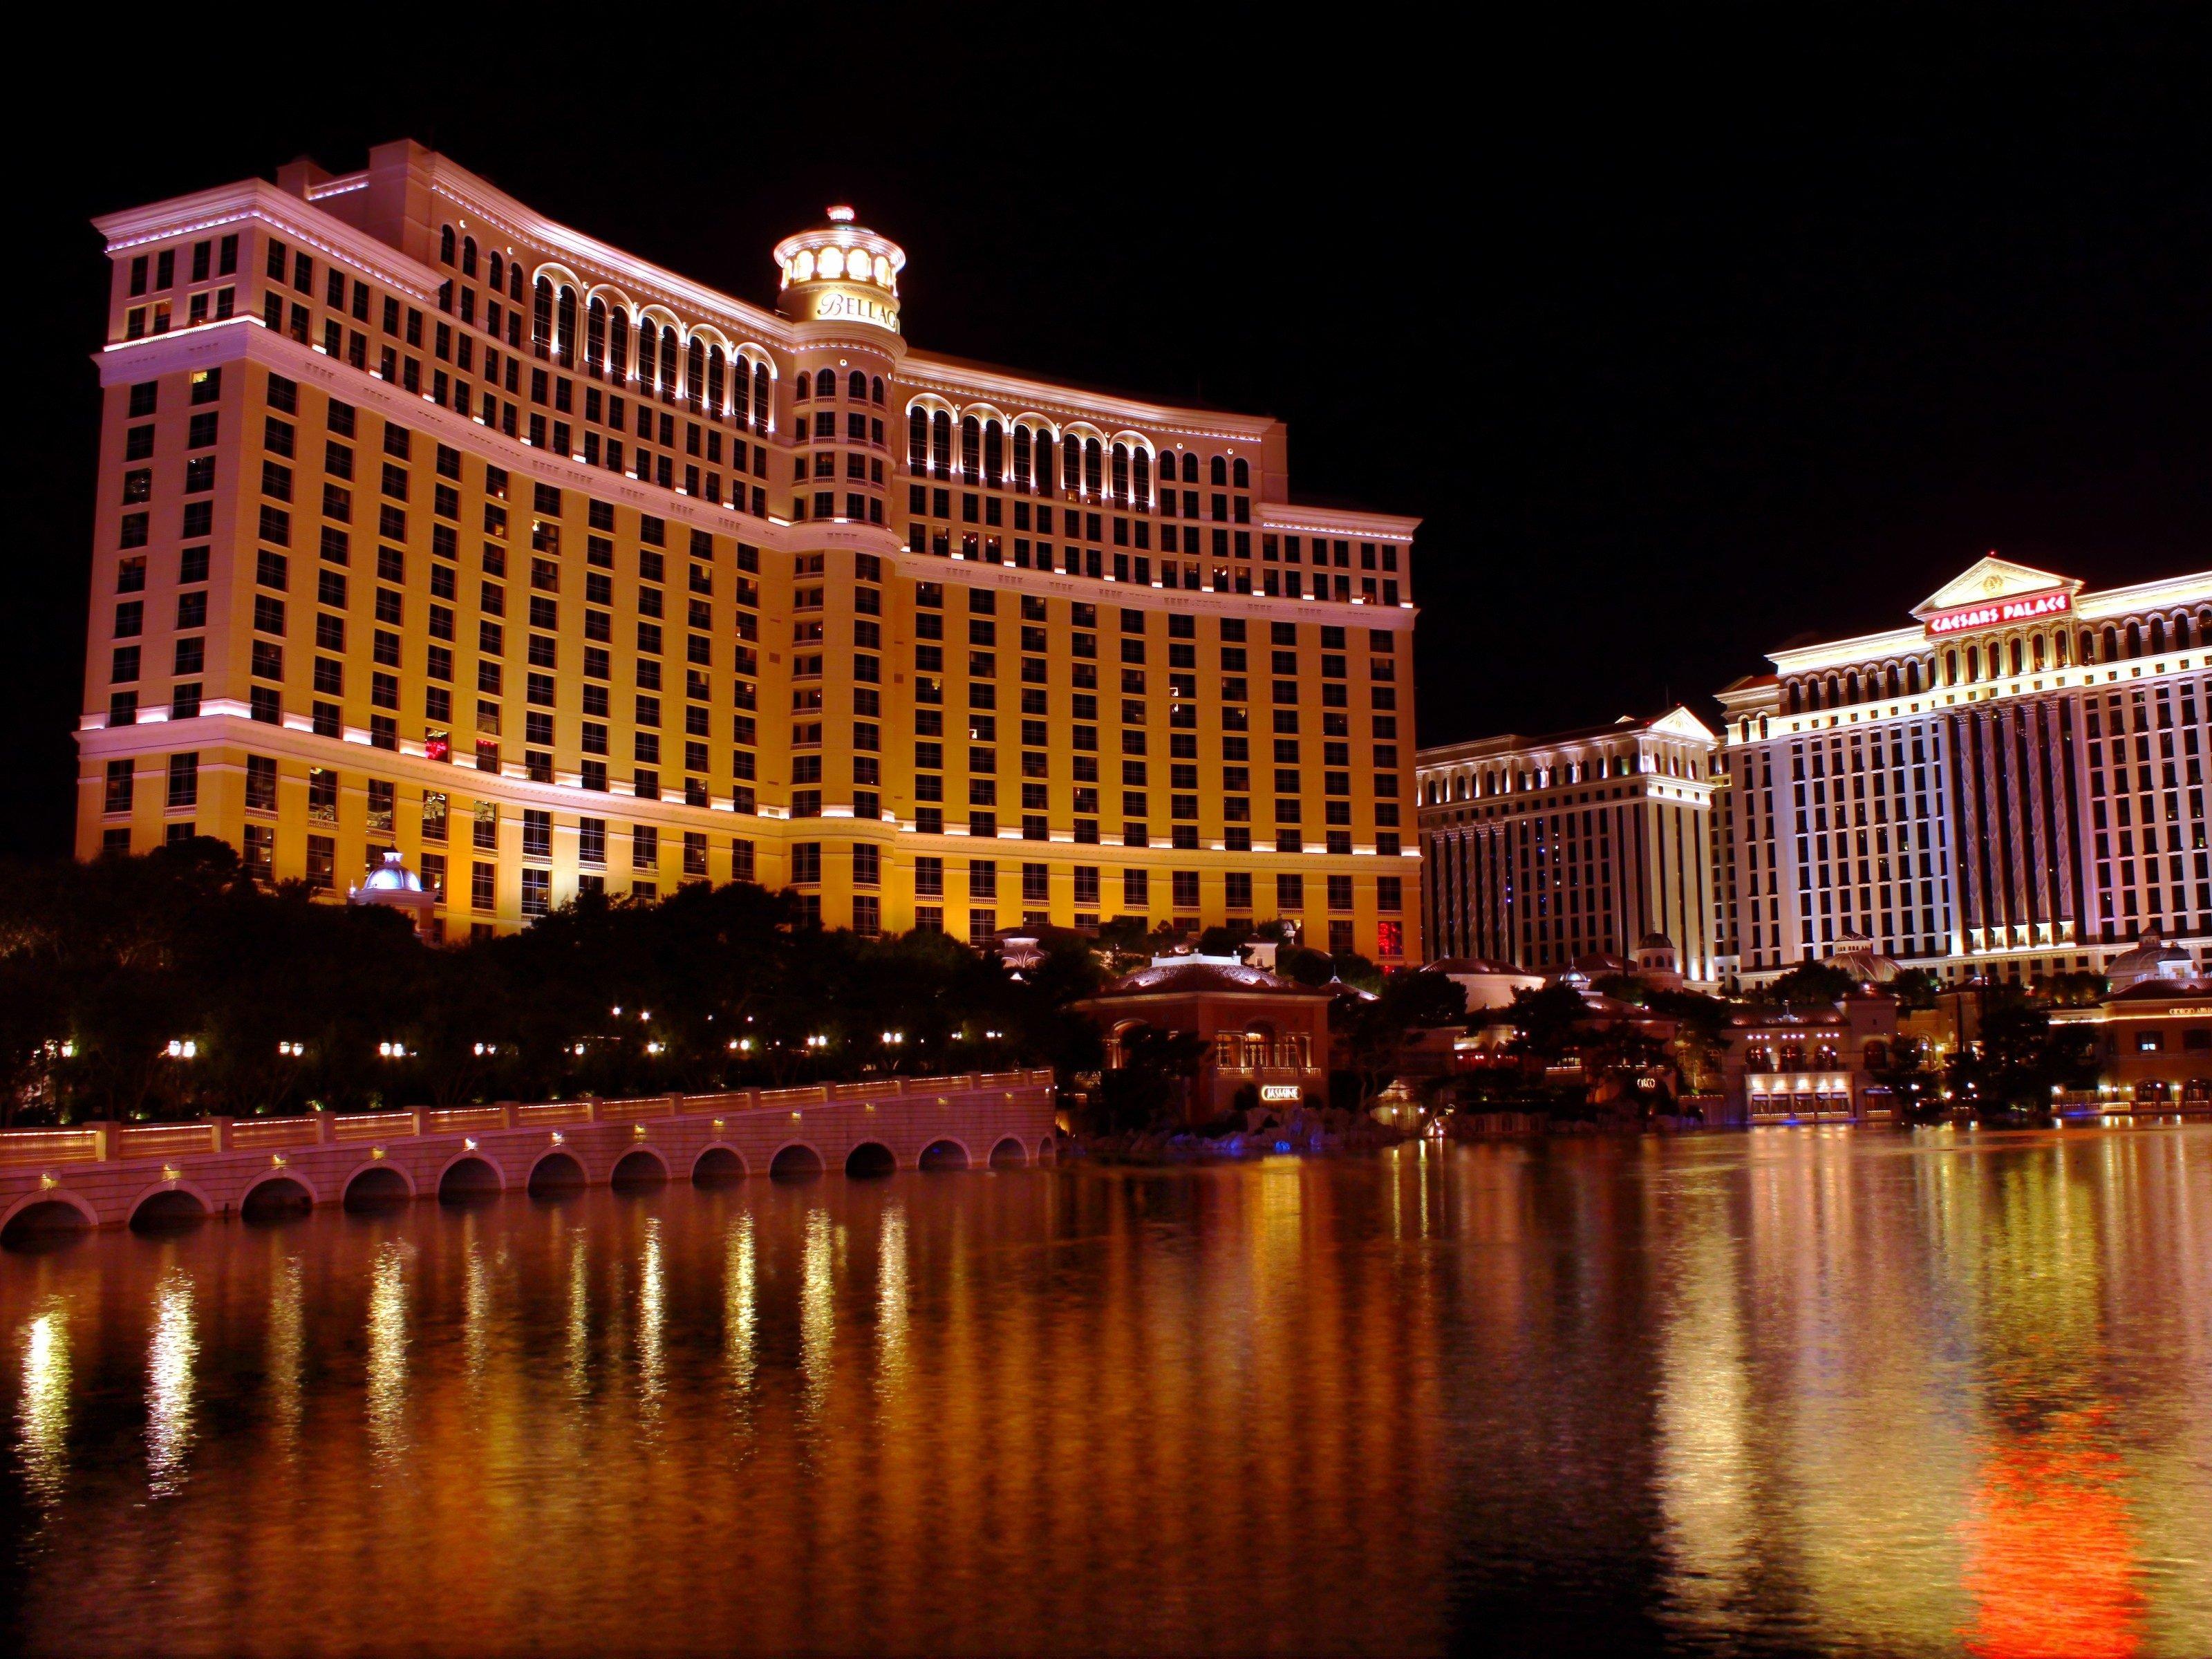 10 Amazing Reasons to Visit Las Vegas: Bellagio